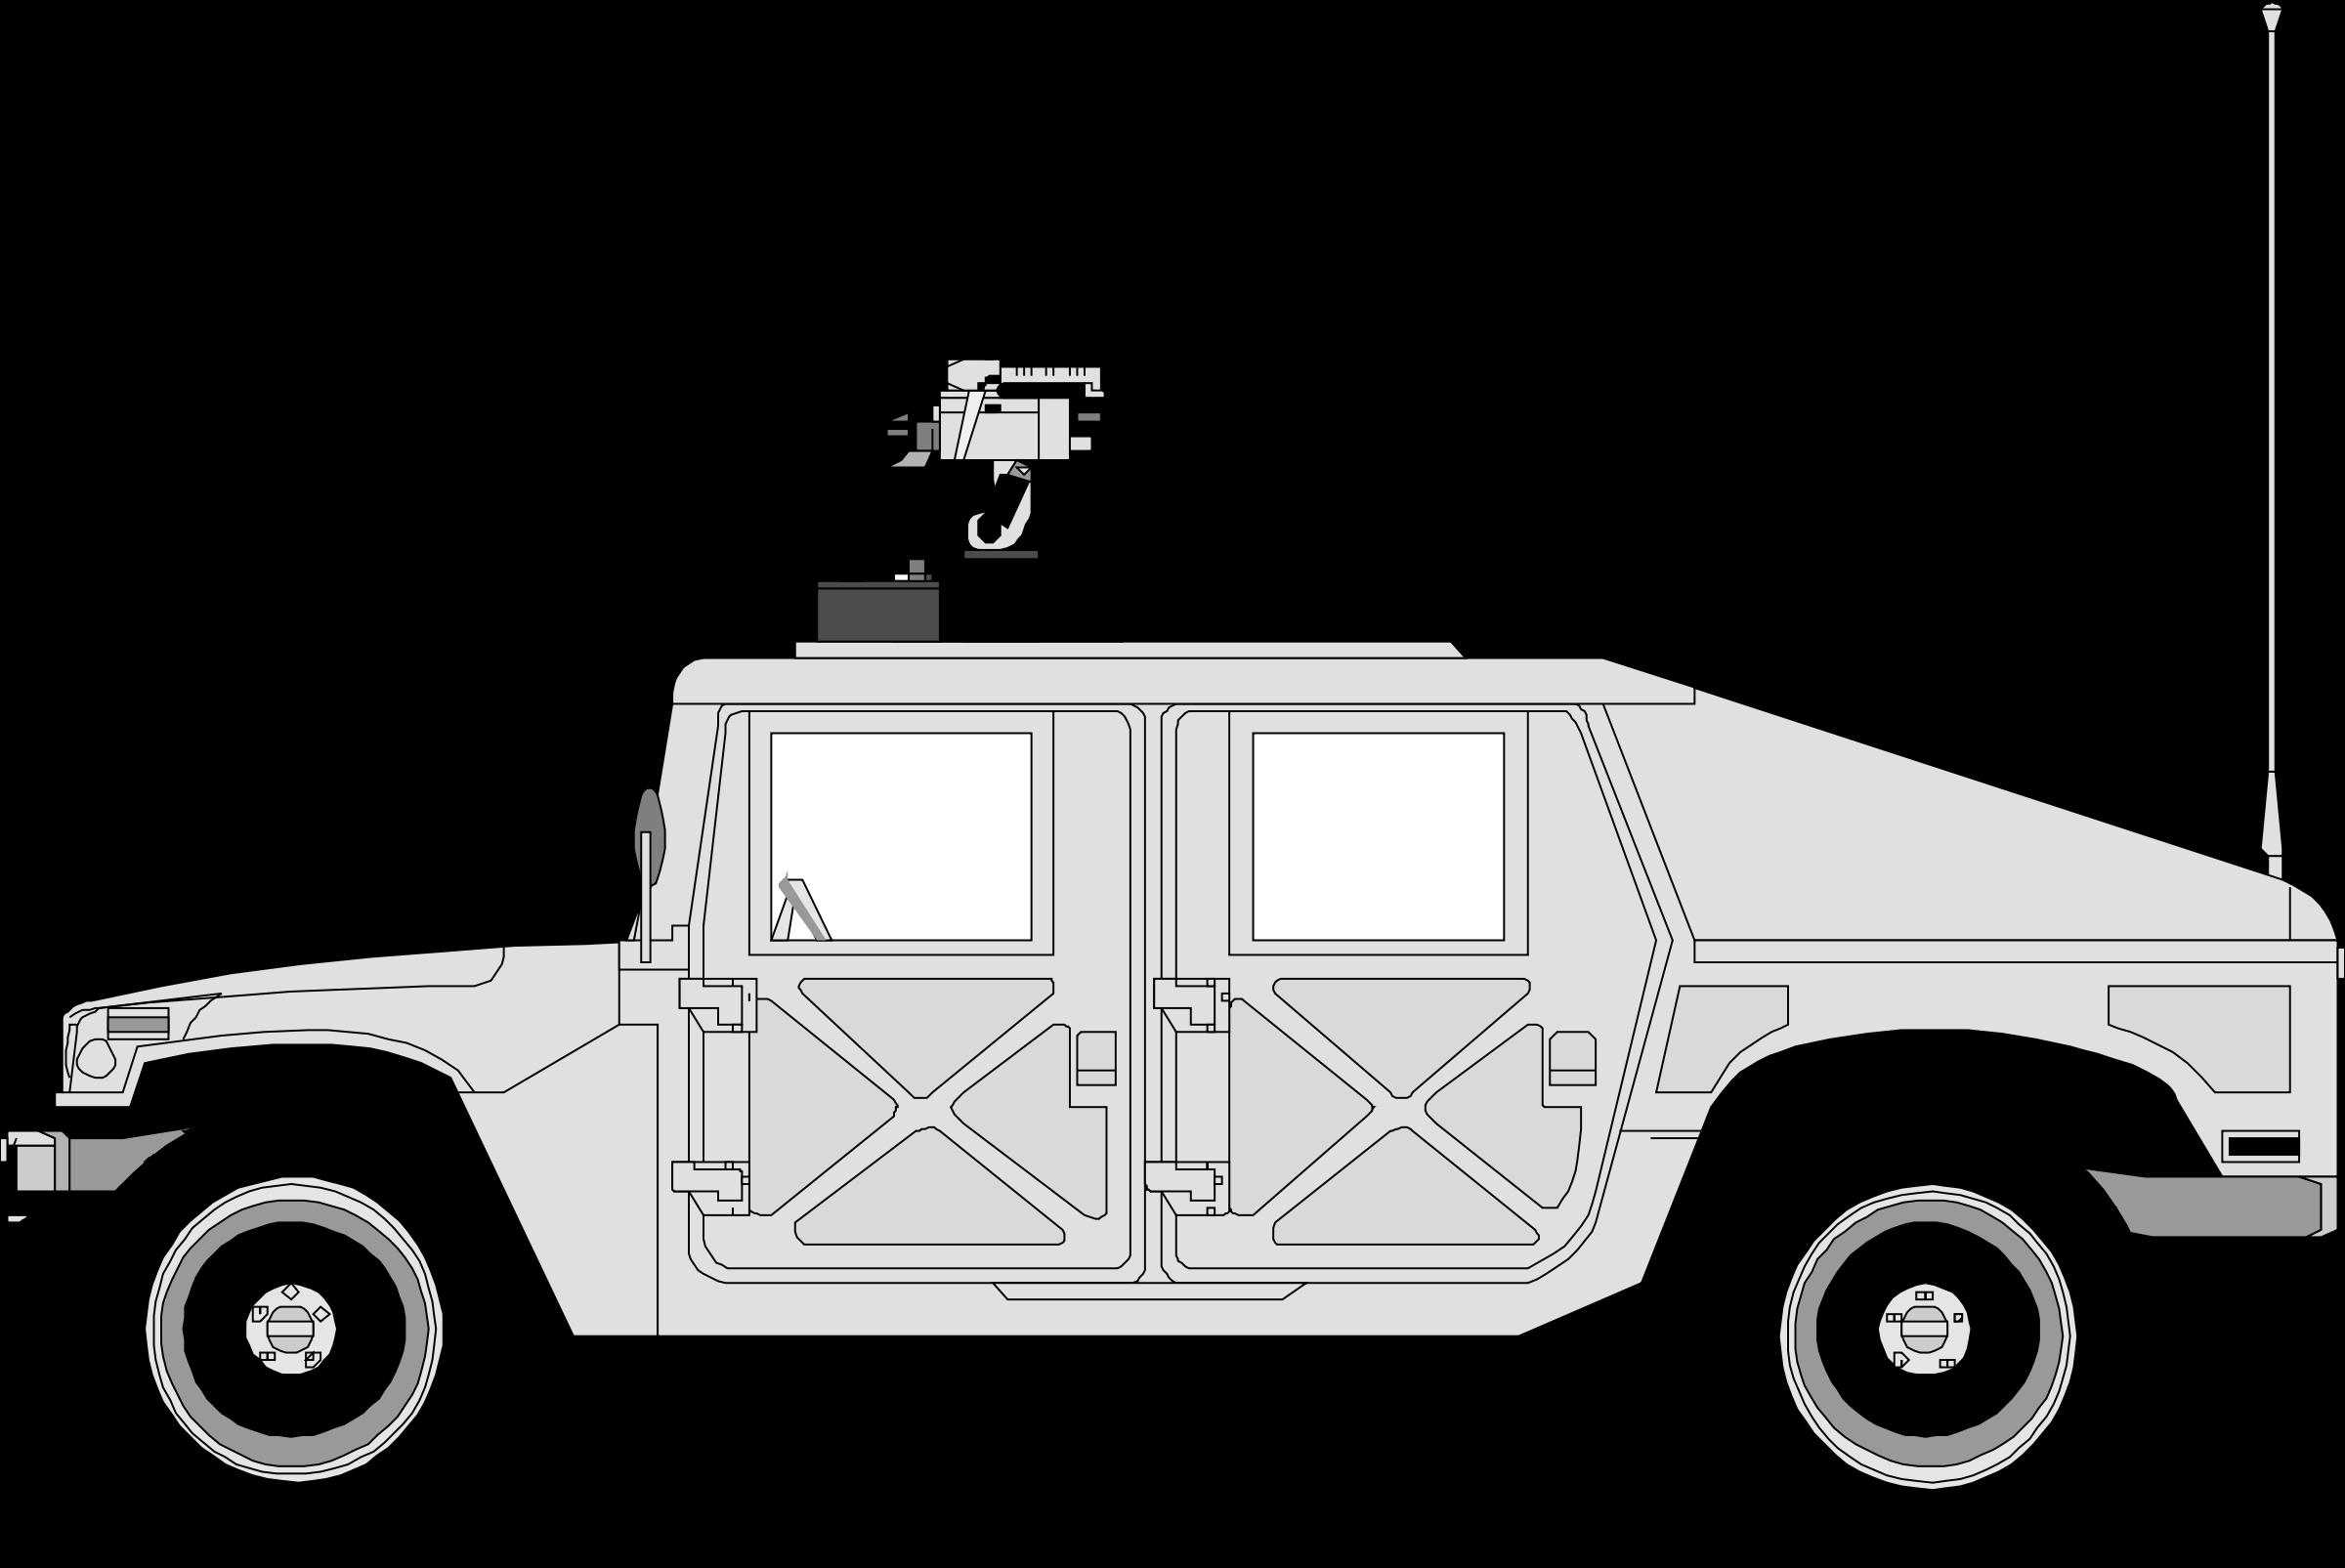 Soldiers clipart car. Humvee big image png